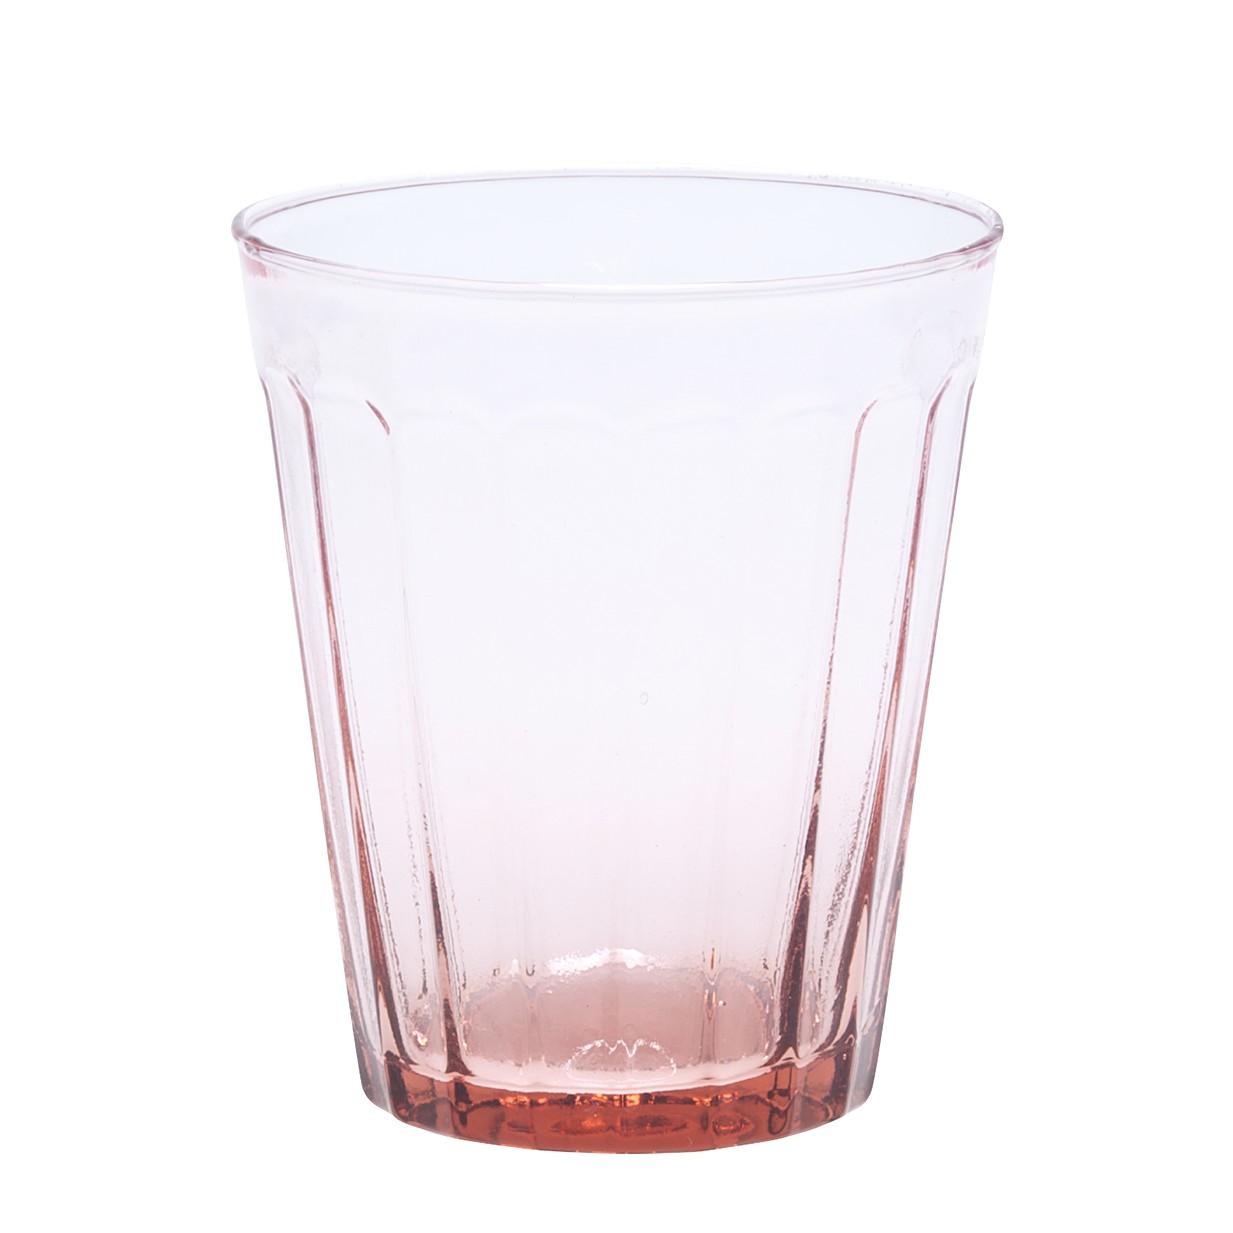 Trinkglas Lucca (6er-Set) – Glas – Pink, BITOSSI HOME kaufen